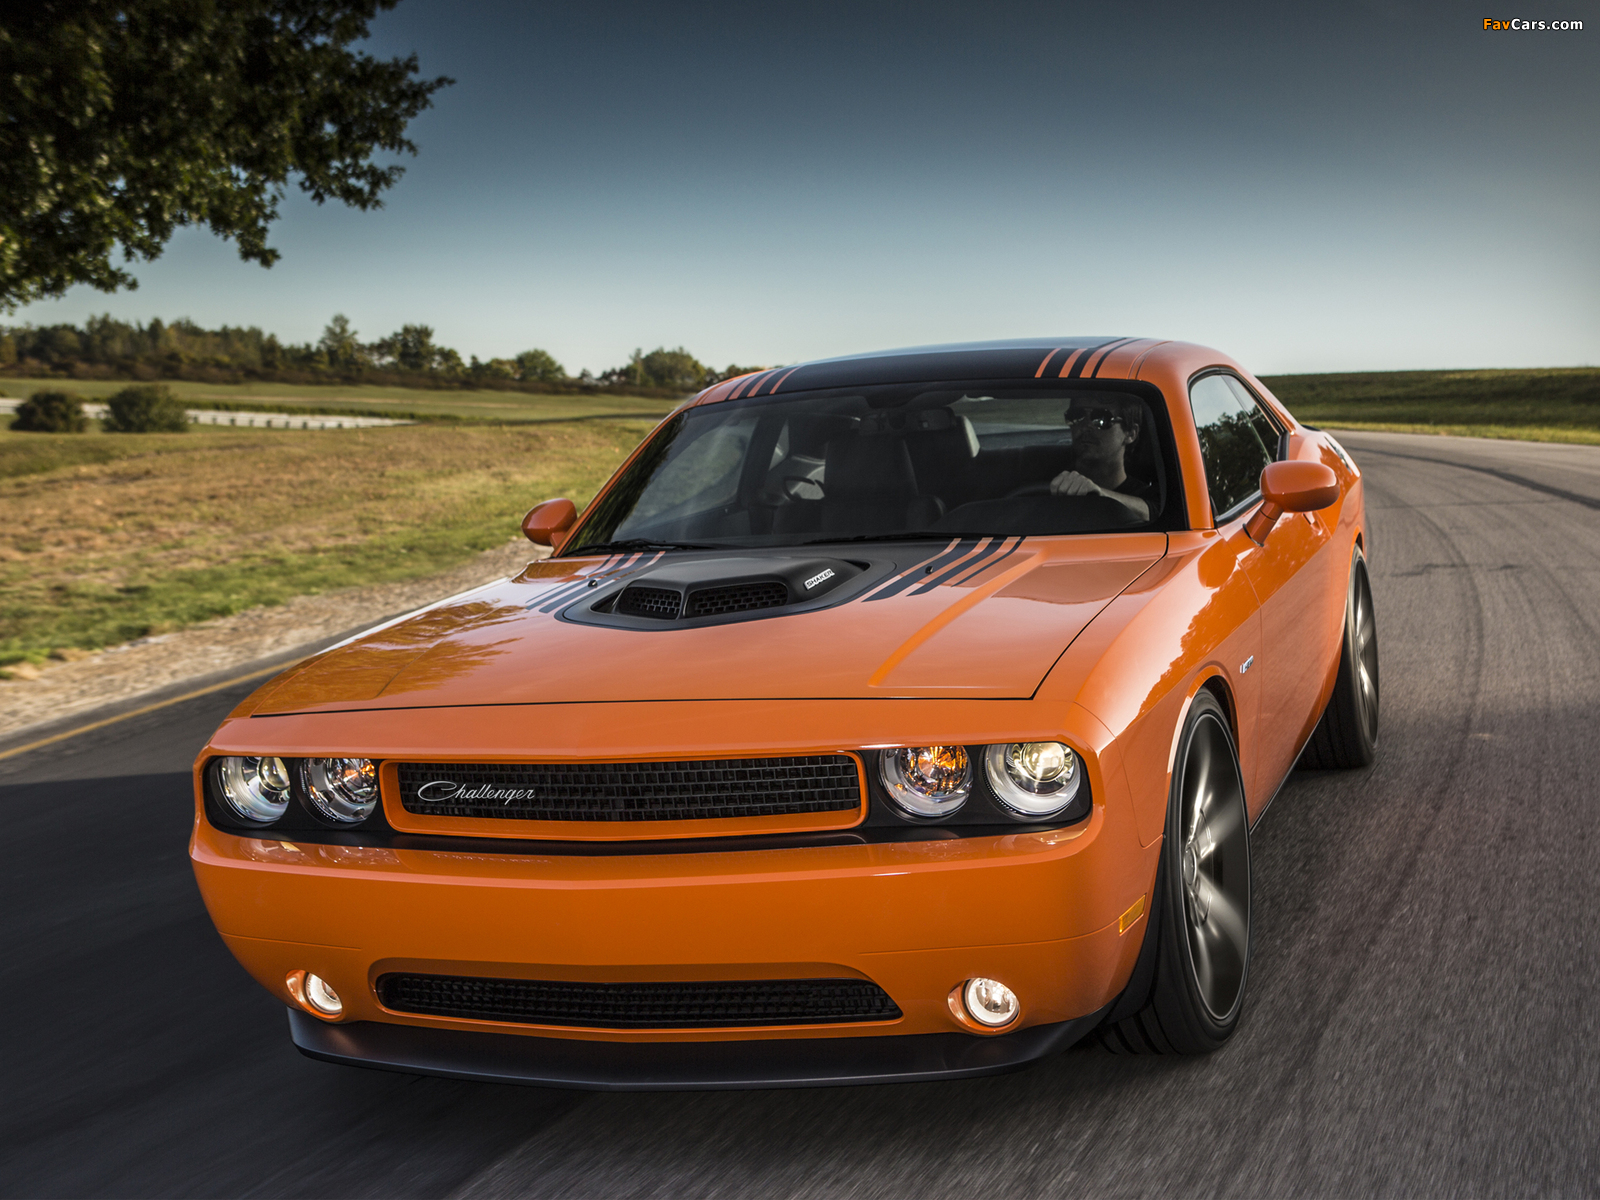 Dodge Challenger R/T Shaker 2014 images (1600 x 1200)